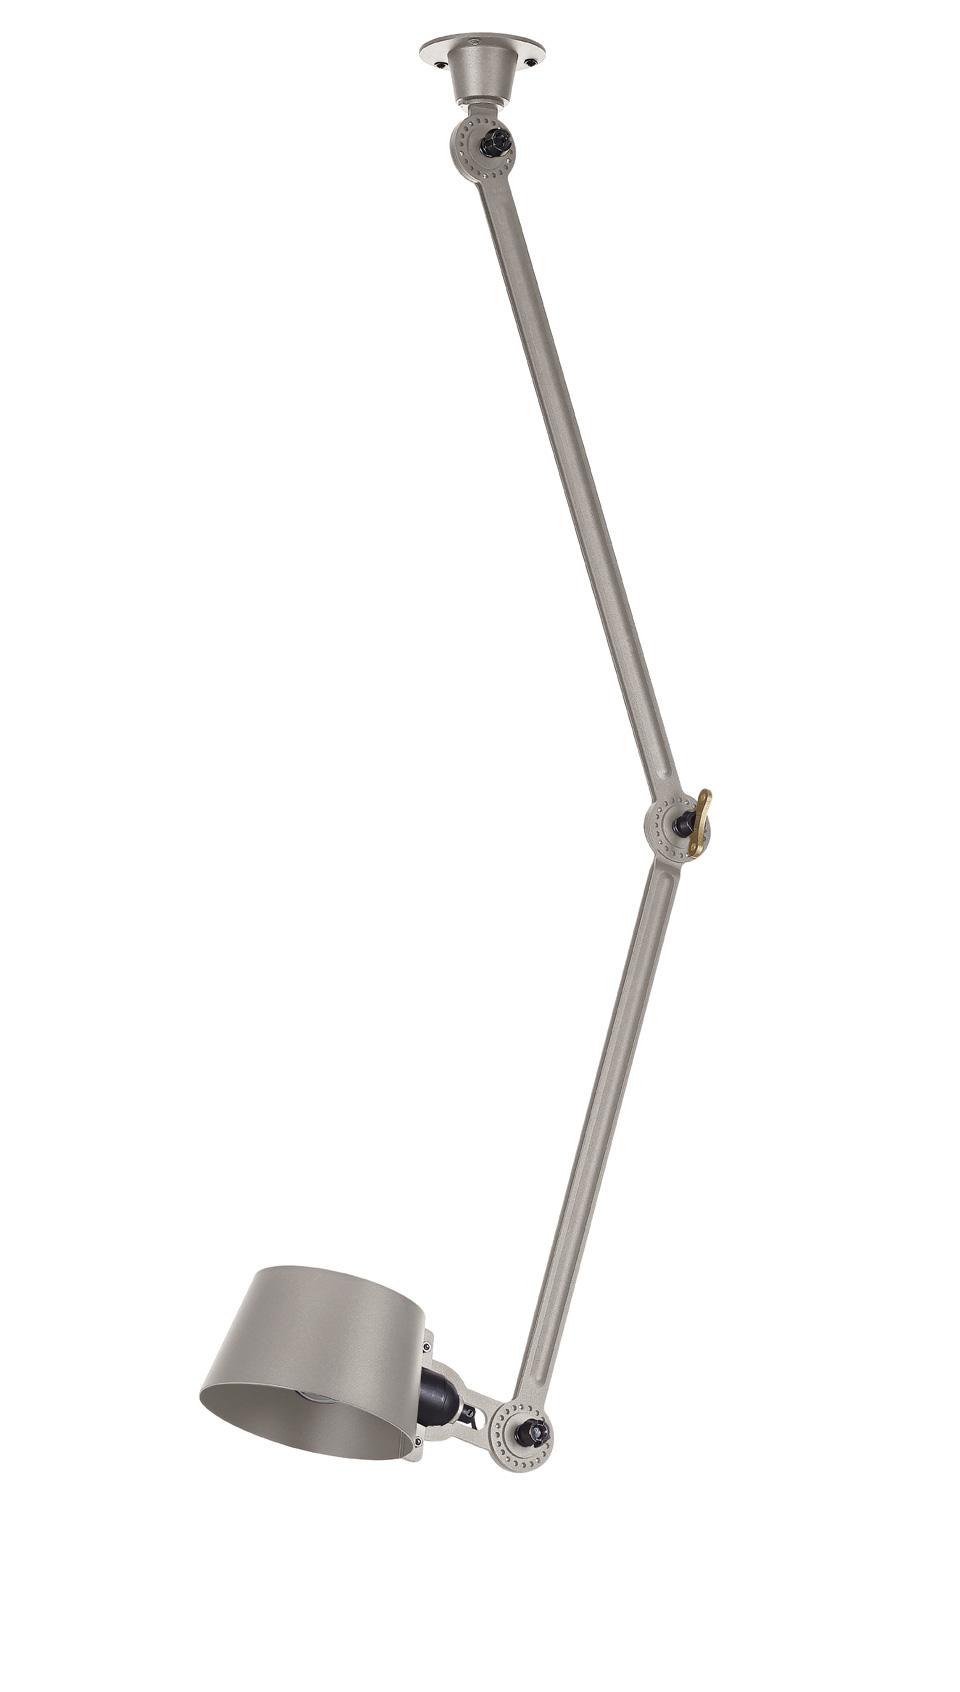 luminaire bras articul fabulous paris prix liseuse bras articul cm gris with luminaire bras. Black Bedroom Furniture Sets. Home Design Ideas